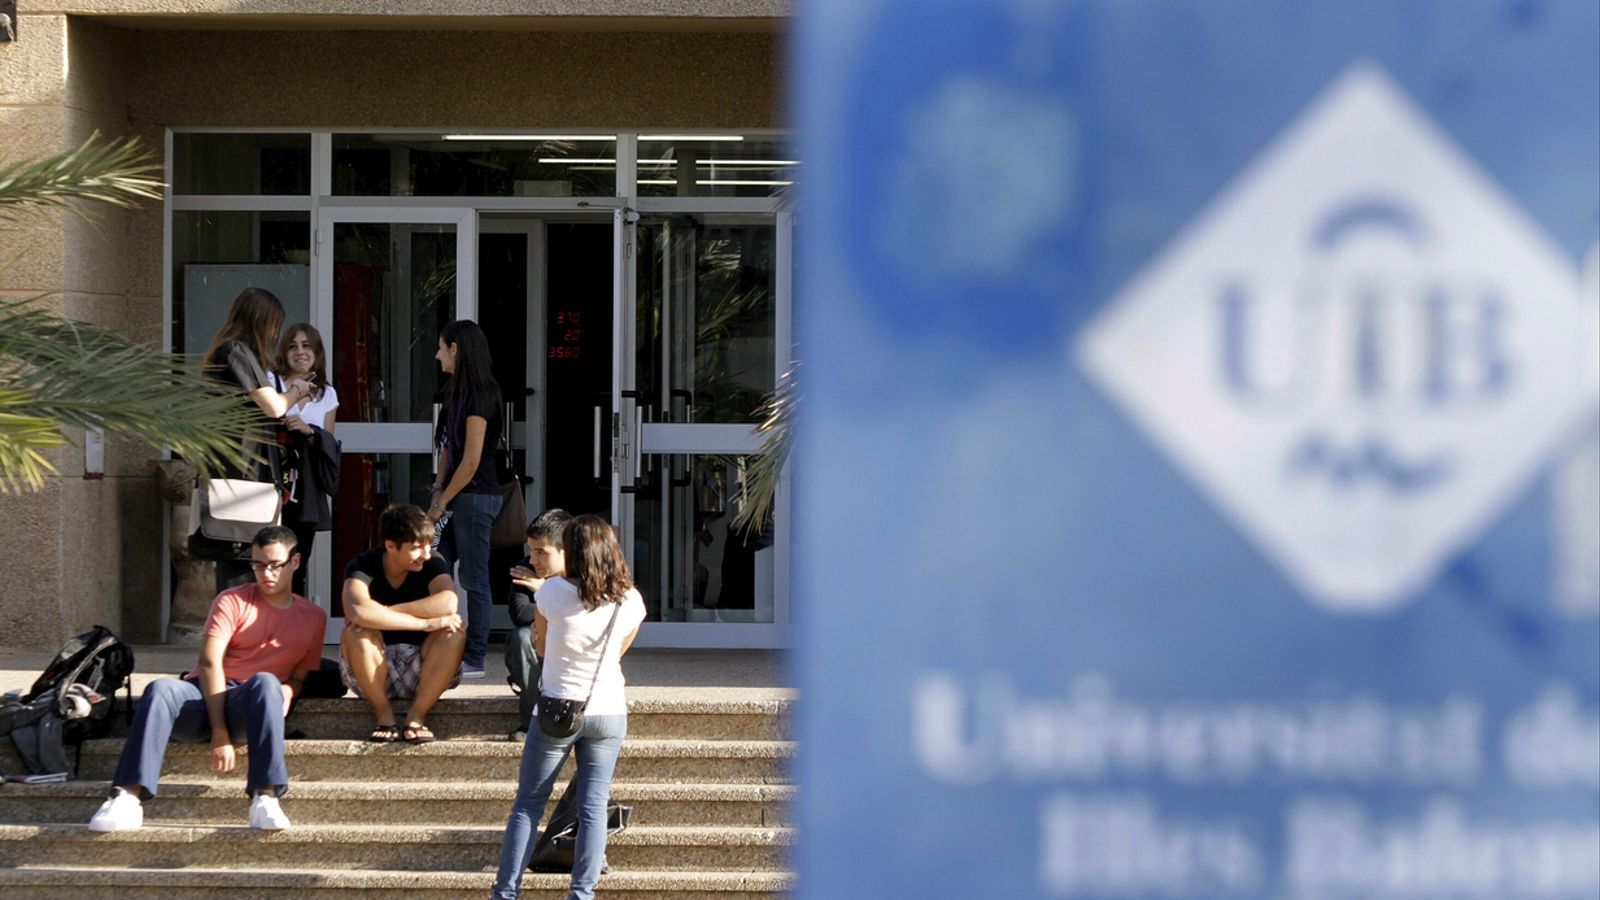 Alumnes al campus de la UIB